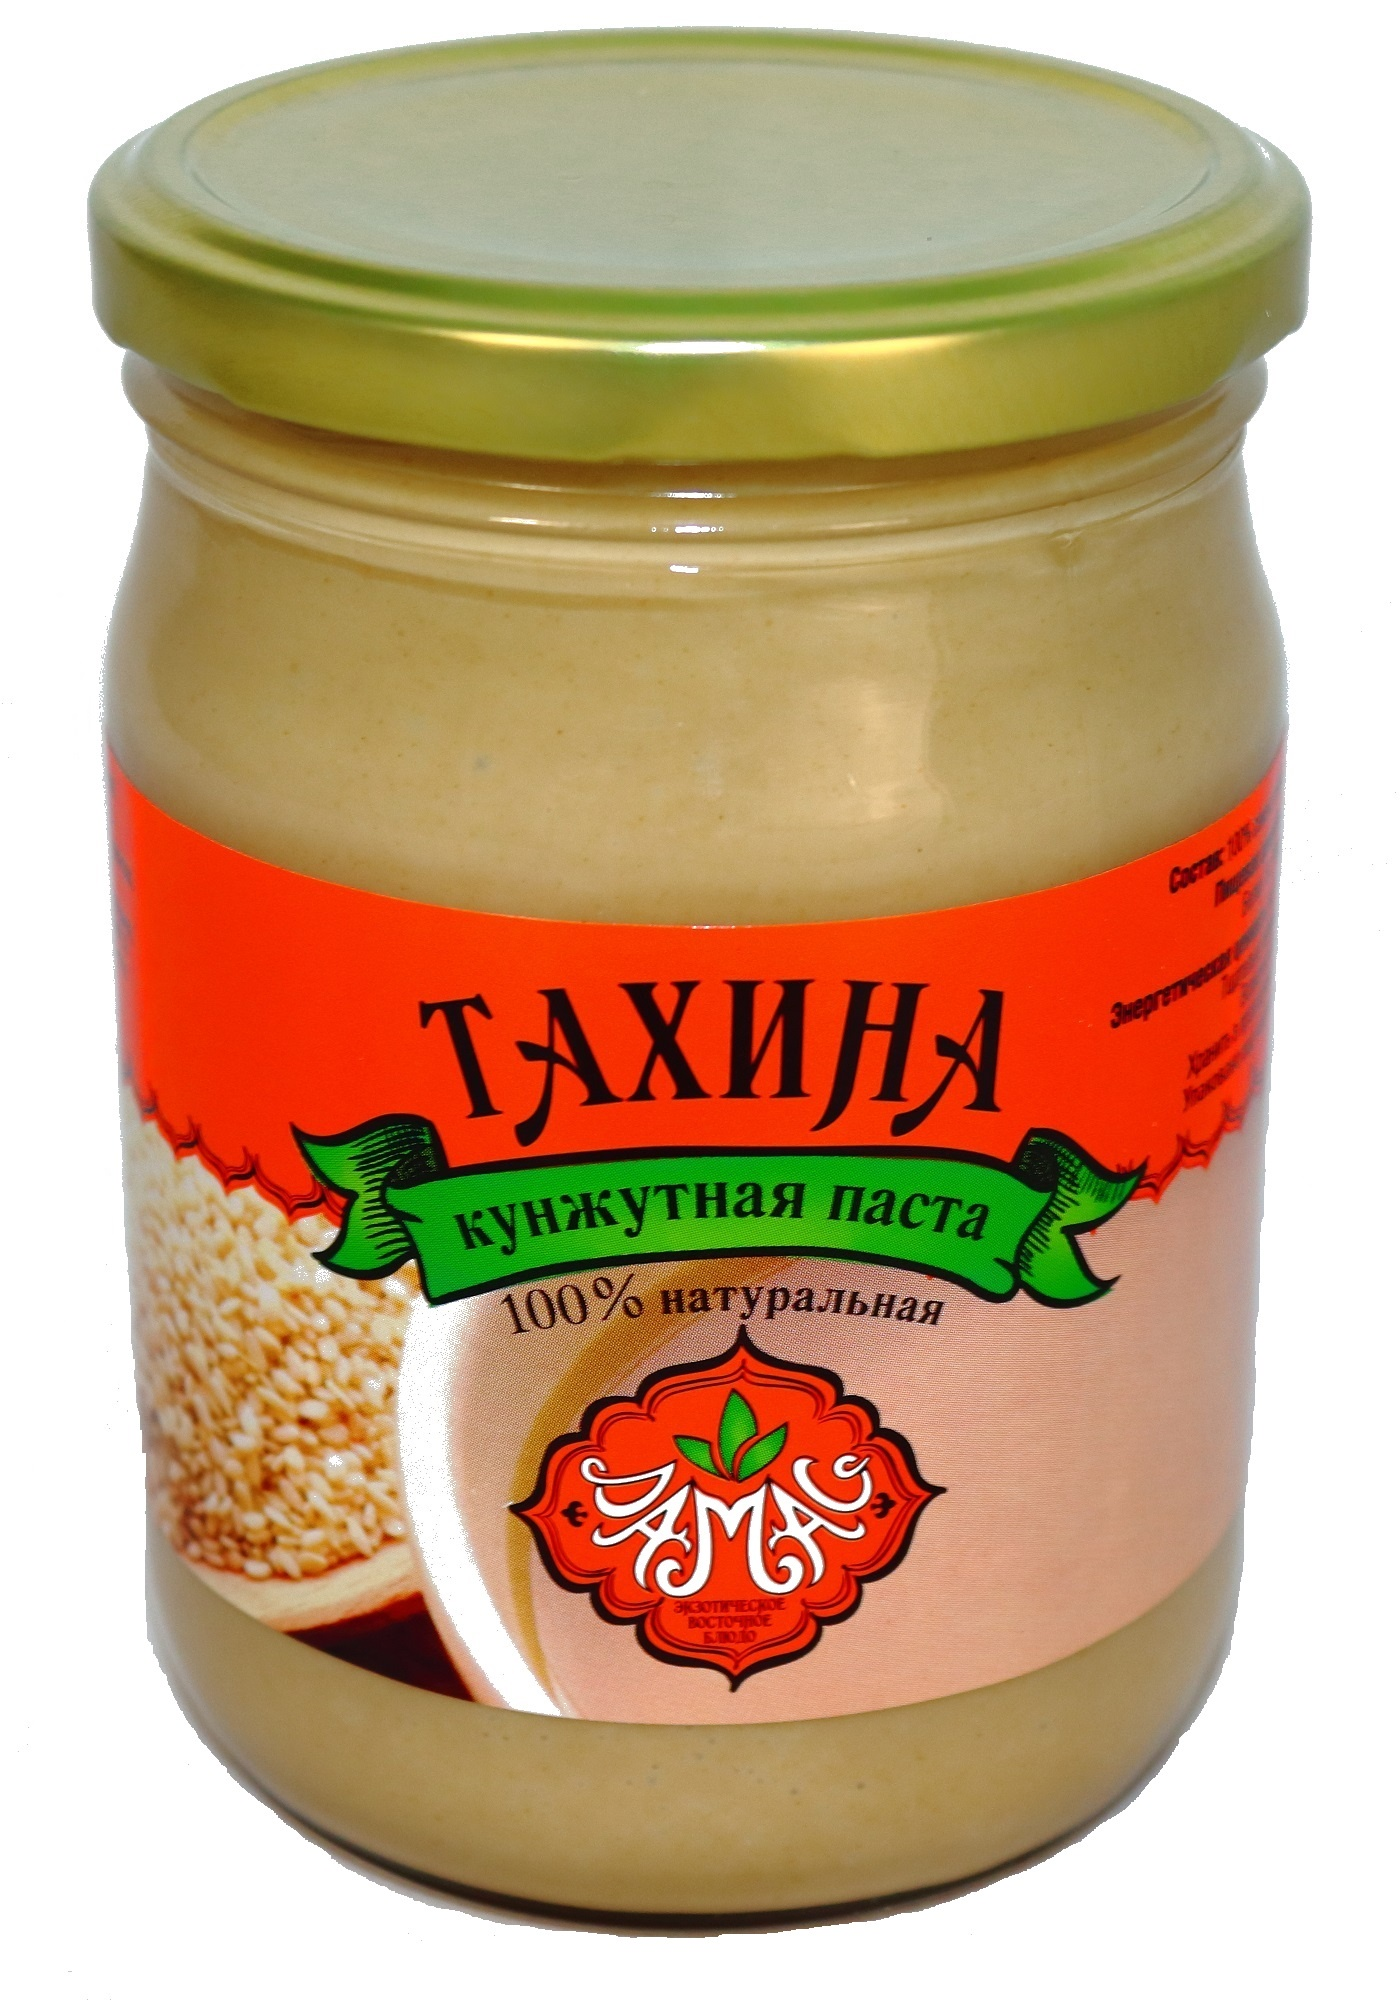 Ореховая паста Дамаск Тахини Тахина кунжутная паста, 500 гр